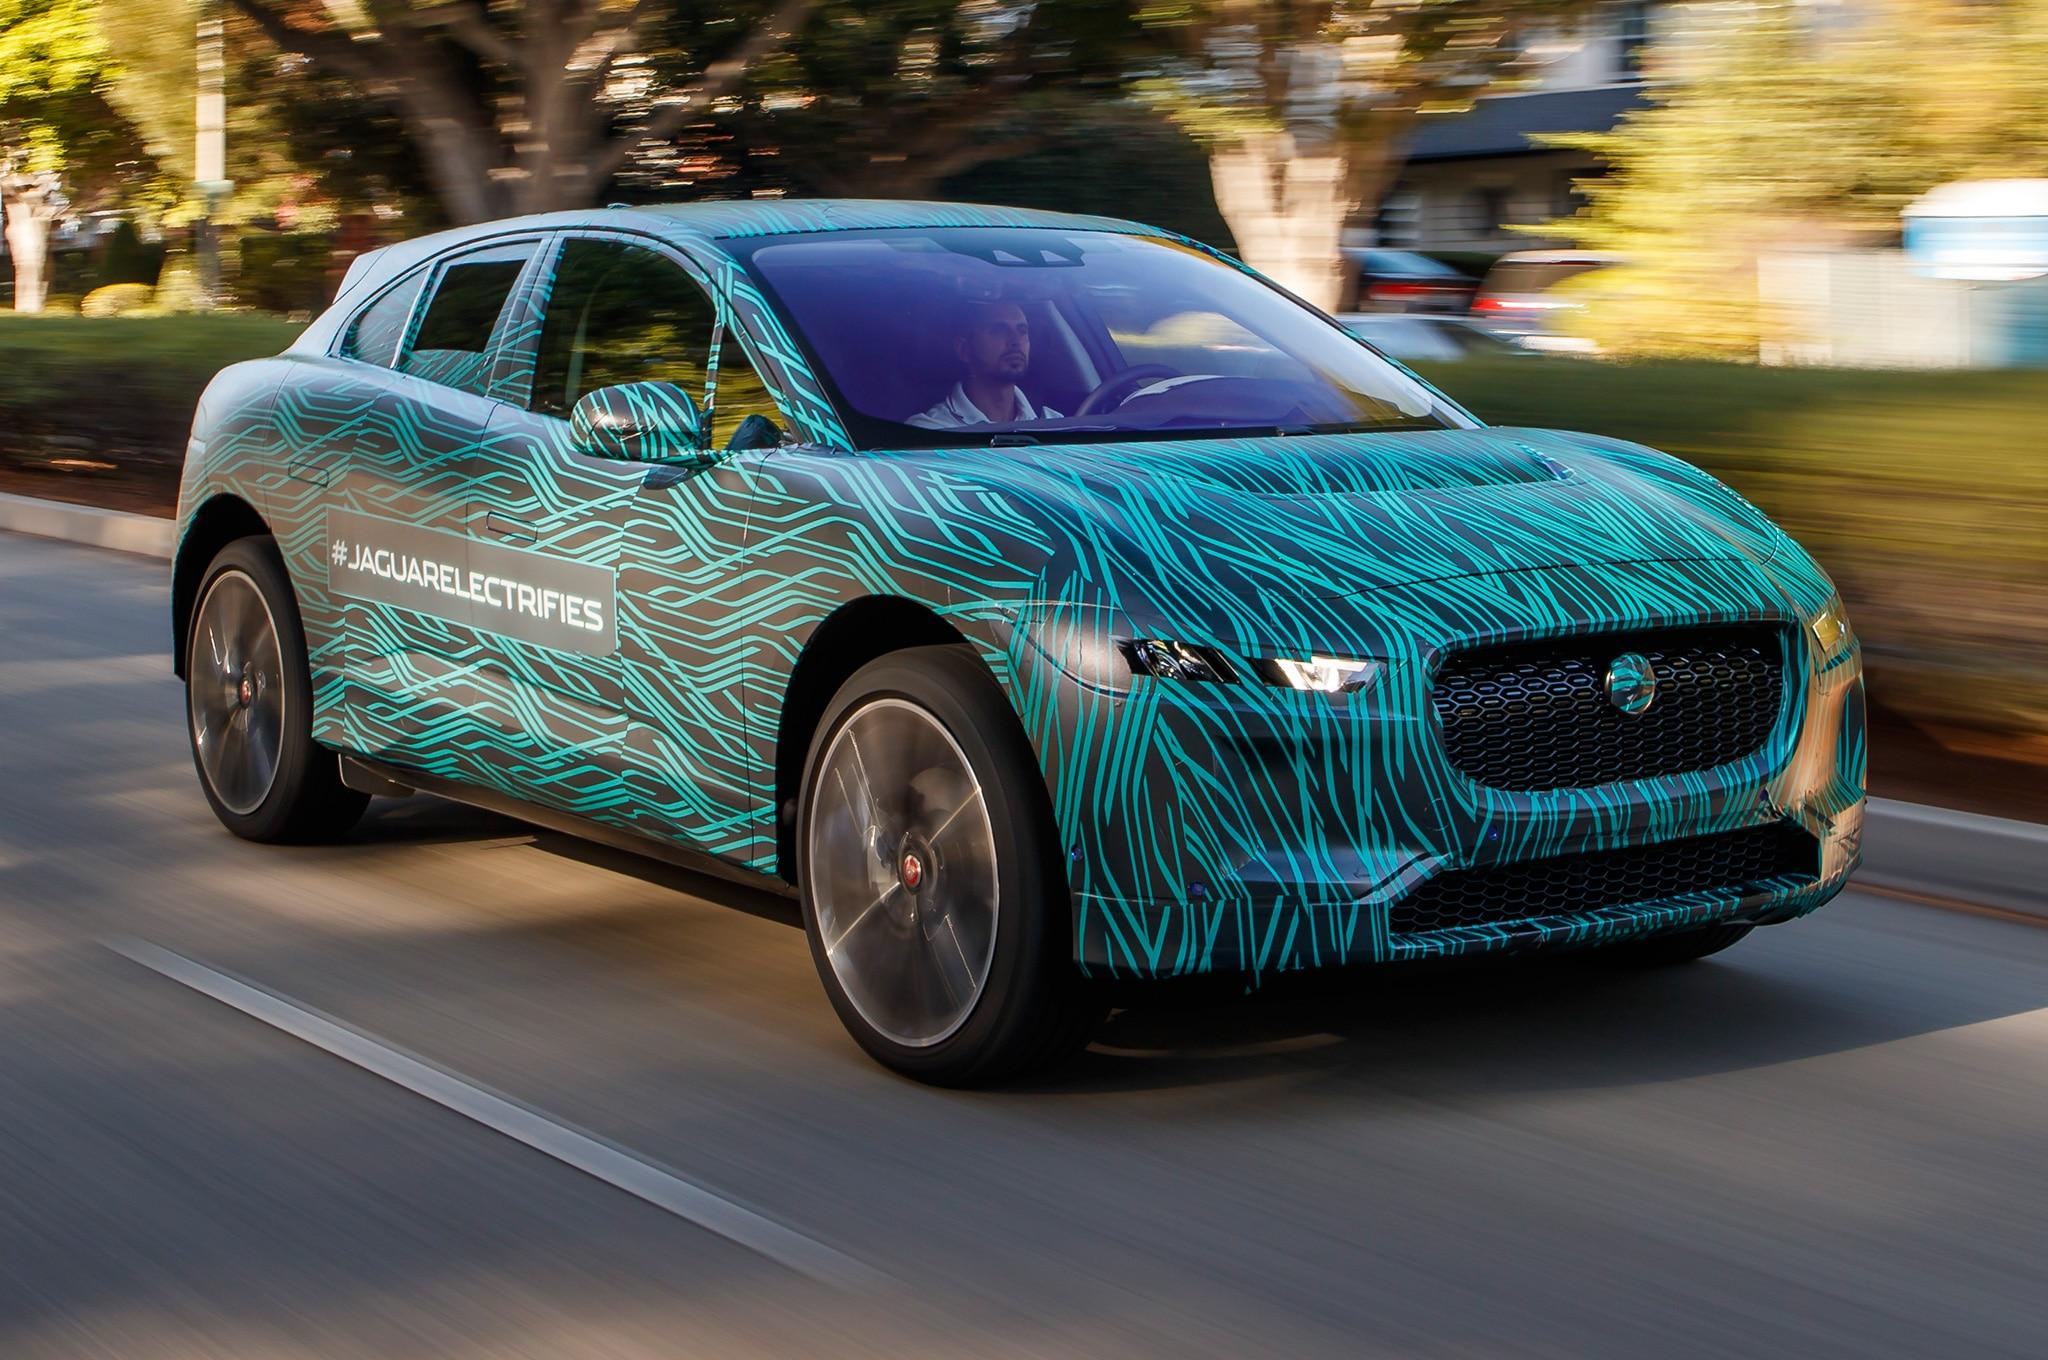 2019 Jaguar I Pace Prototype In Motion